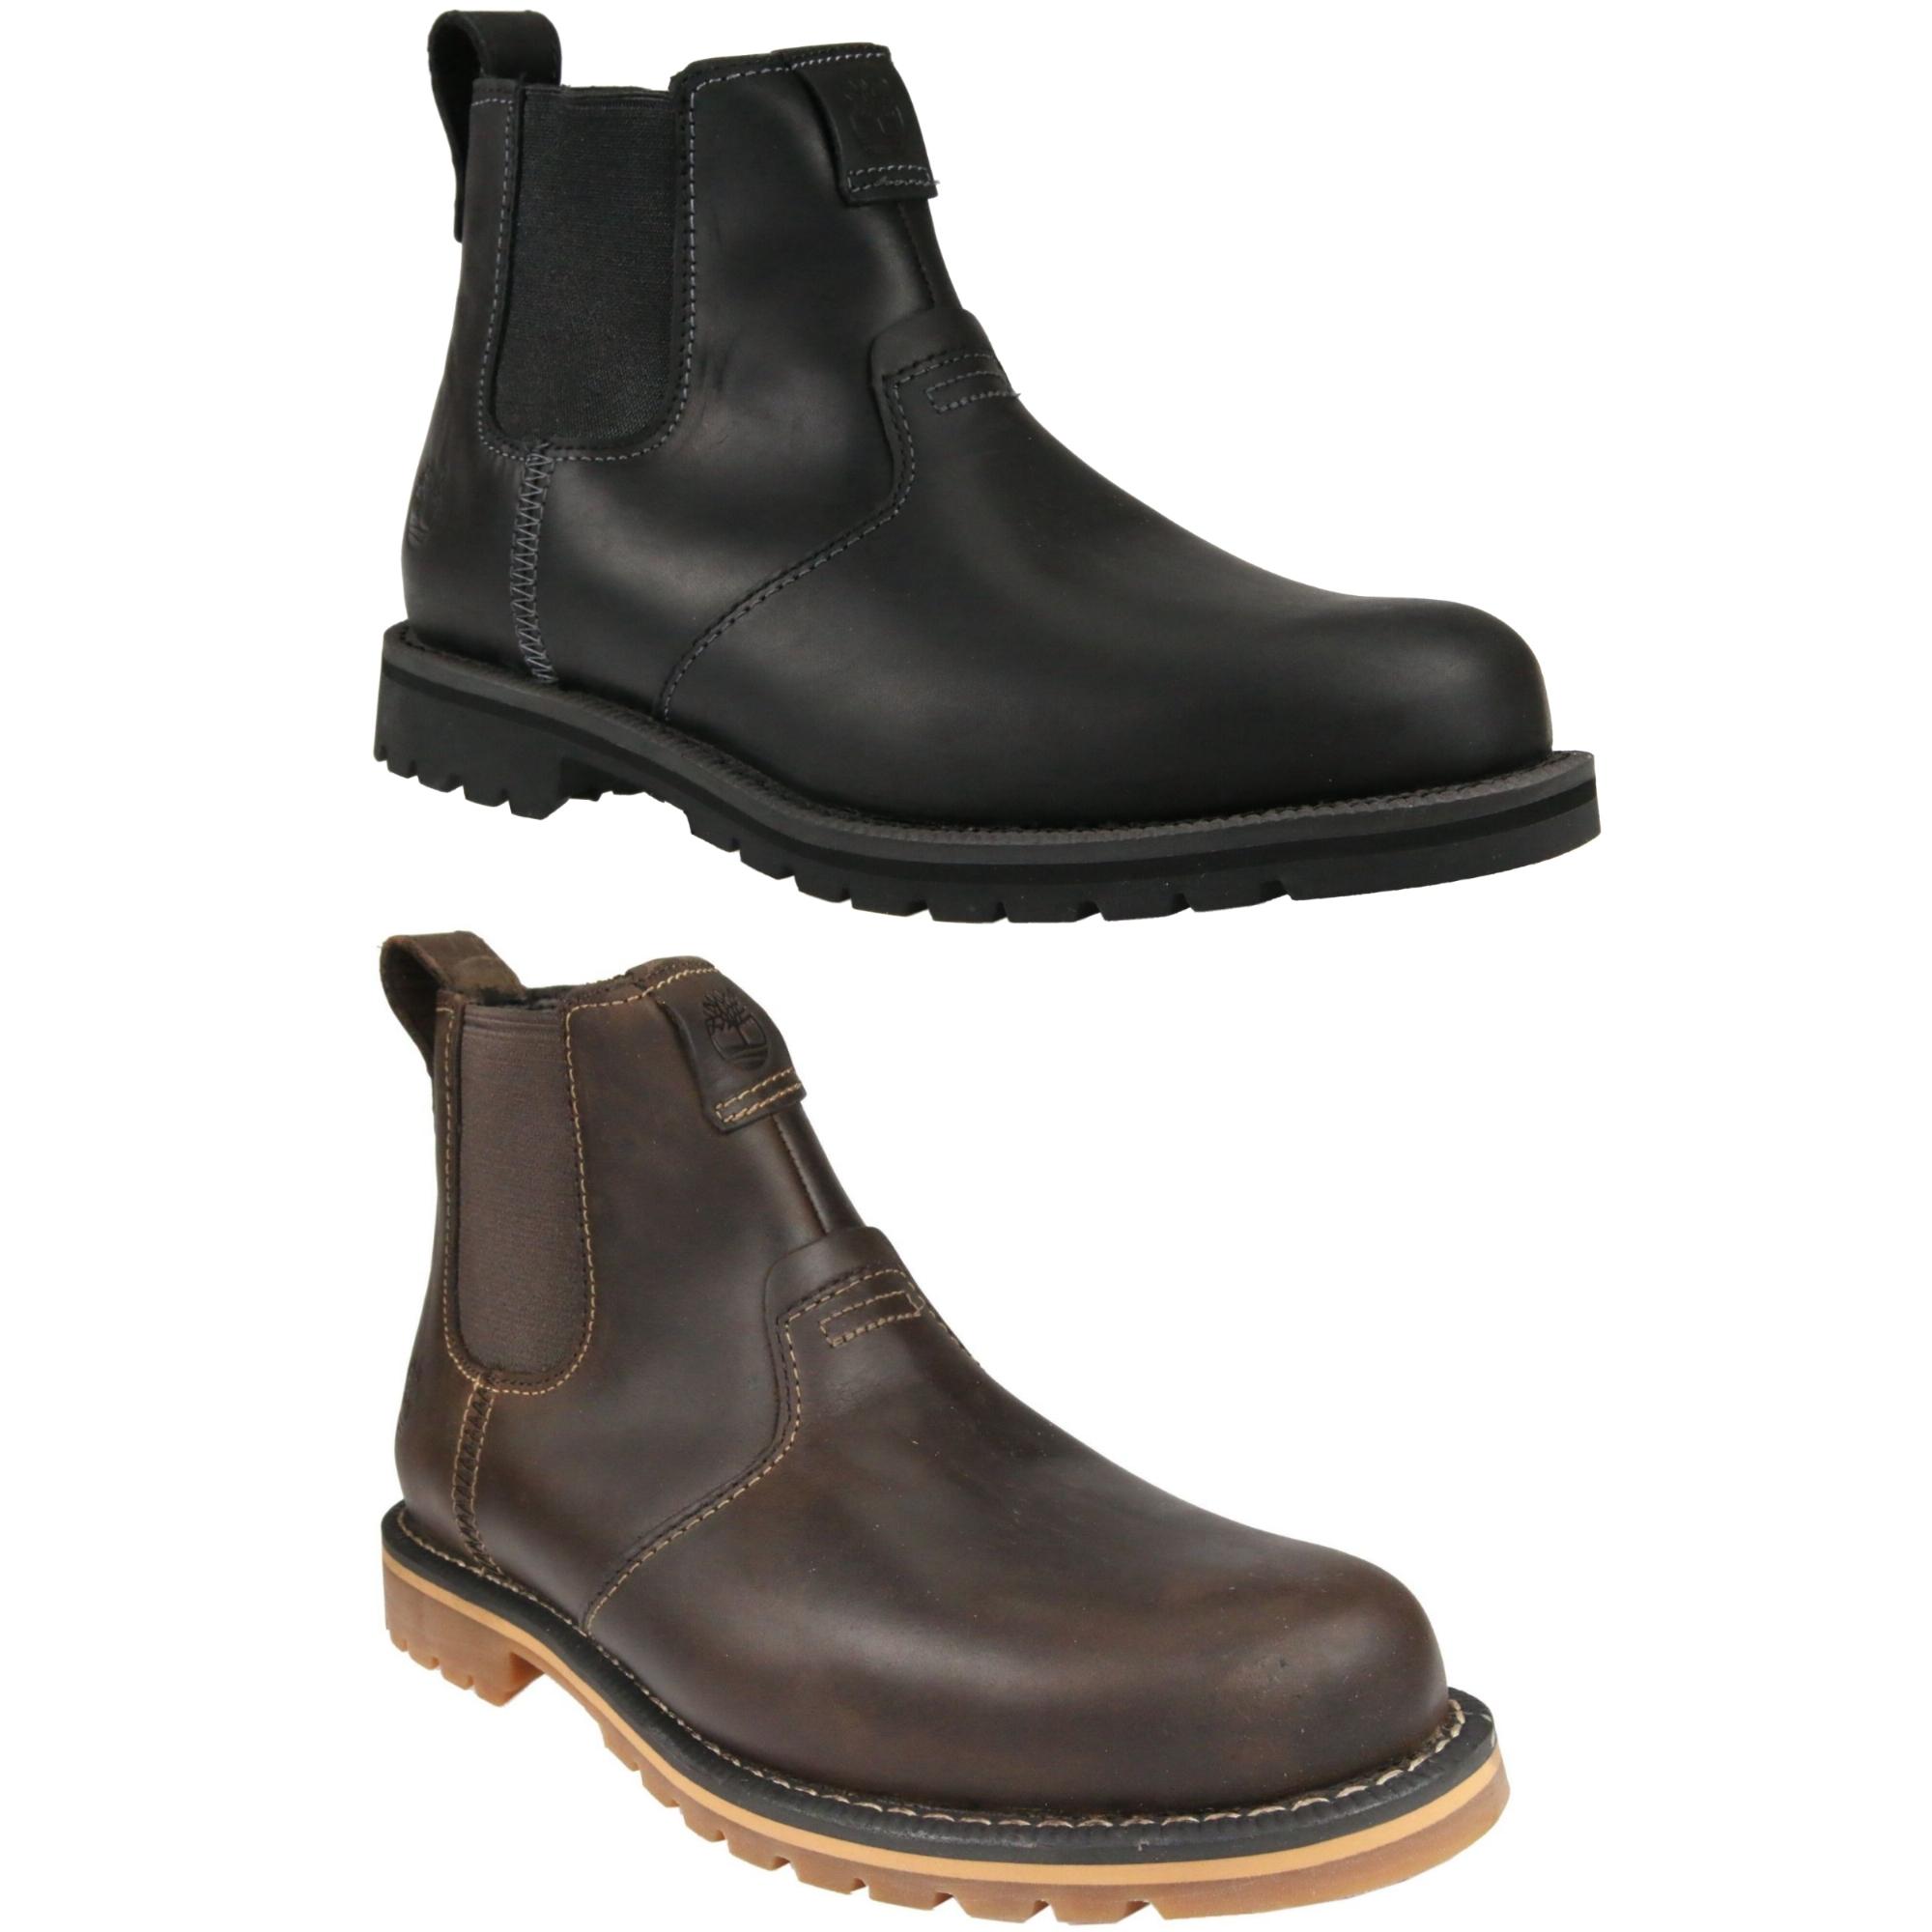 timberland grantly chelsea boots schuhe stiefel echtleder winter herren ebay. Black Bedroom Furniture Sets. Home Design Ideas